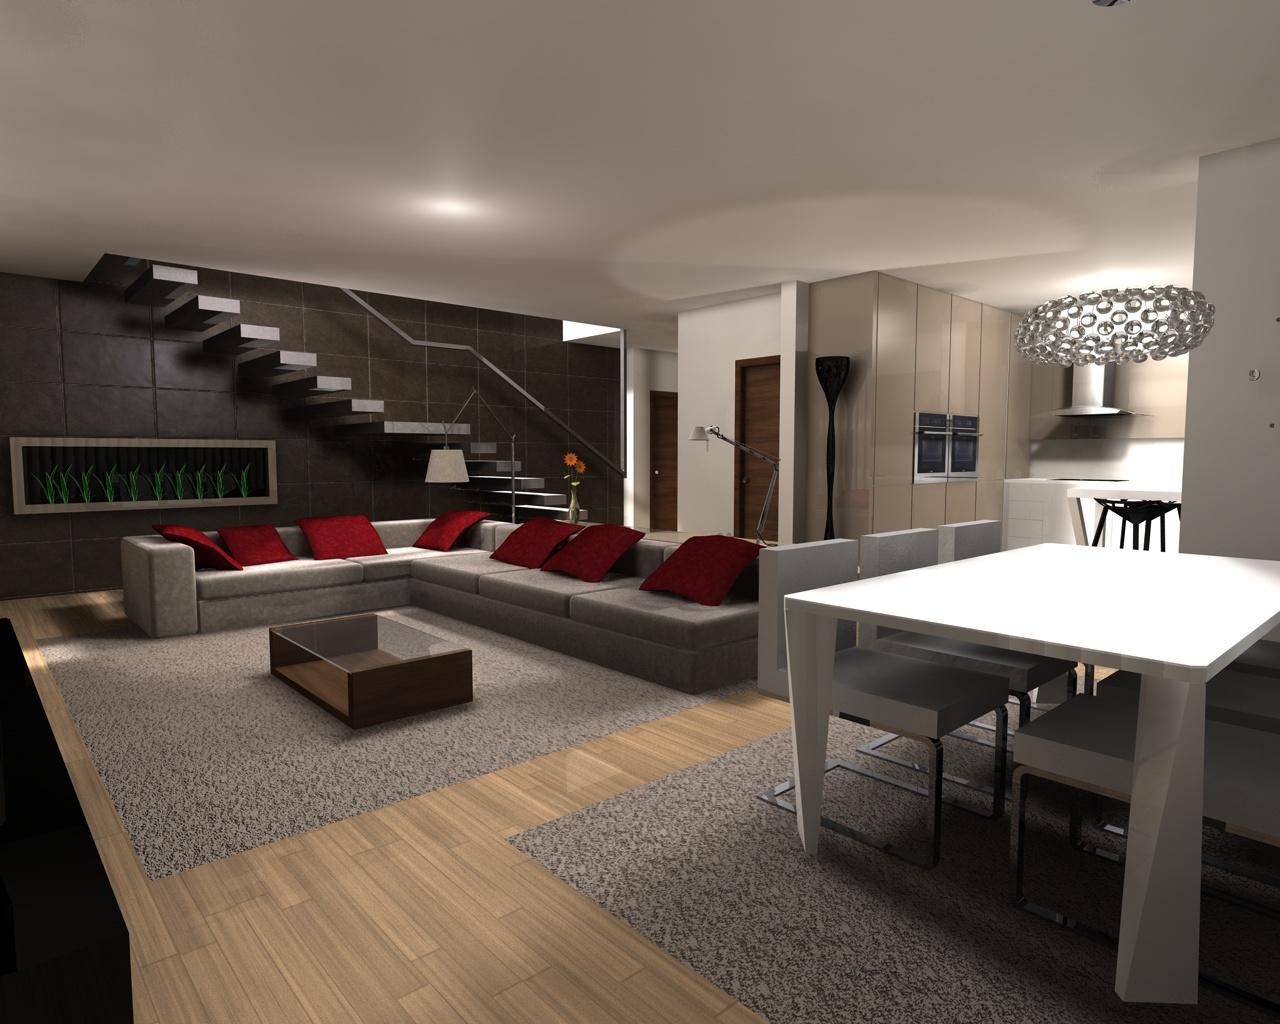 Casa Korean Living Room Design   Living Room Interior Designs